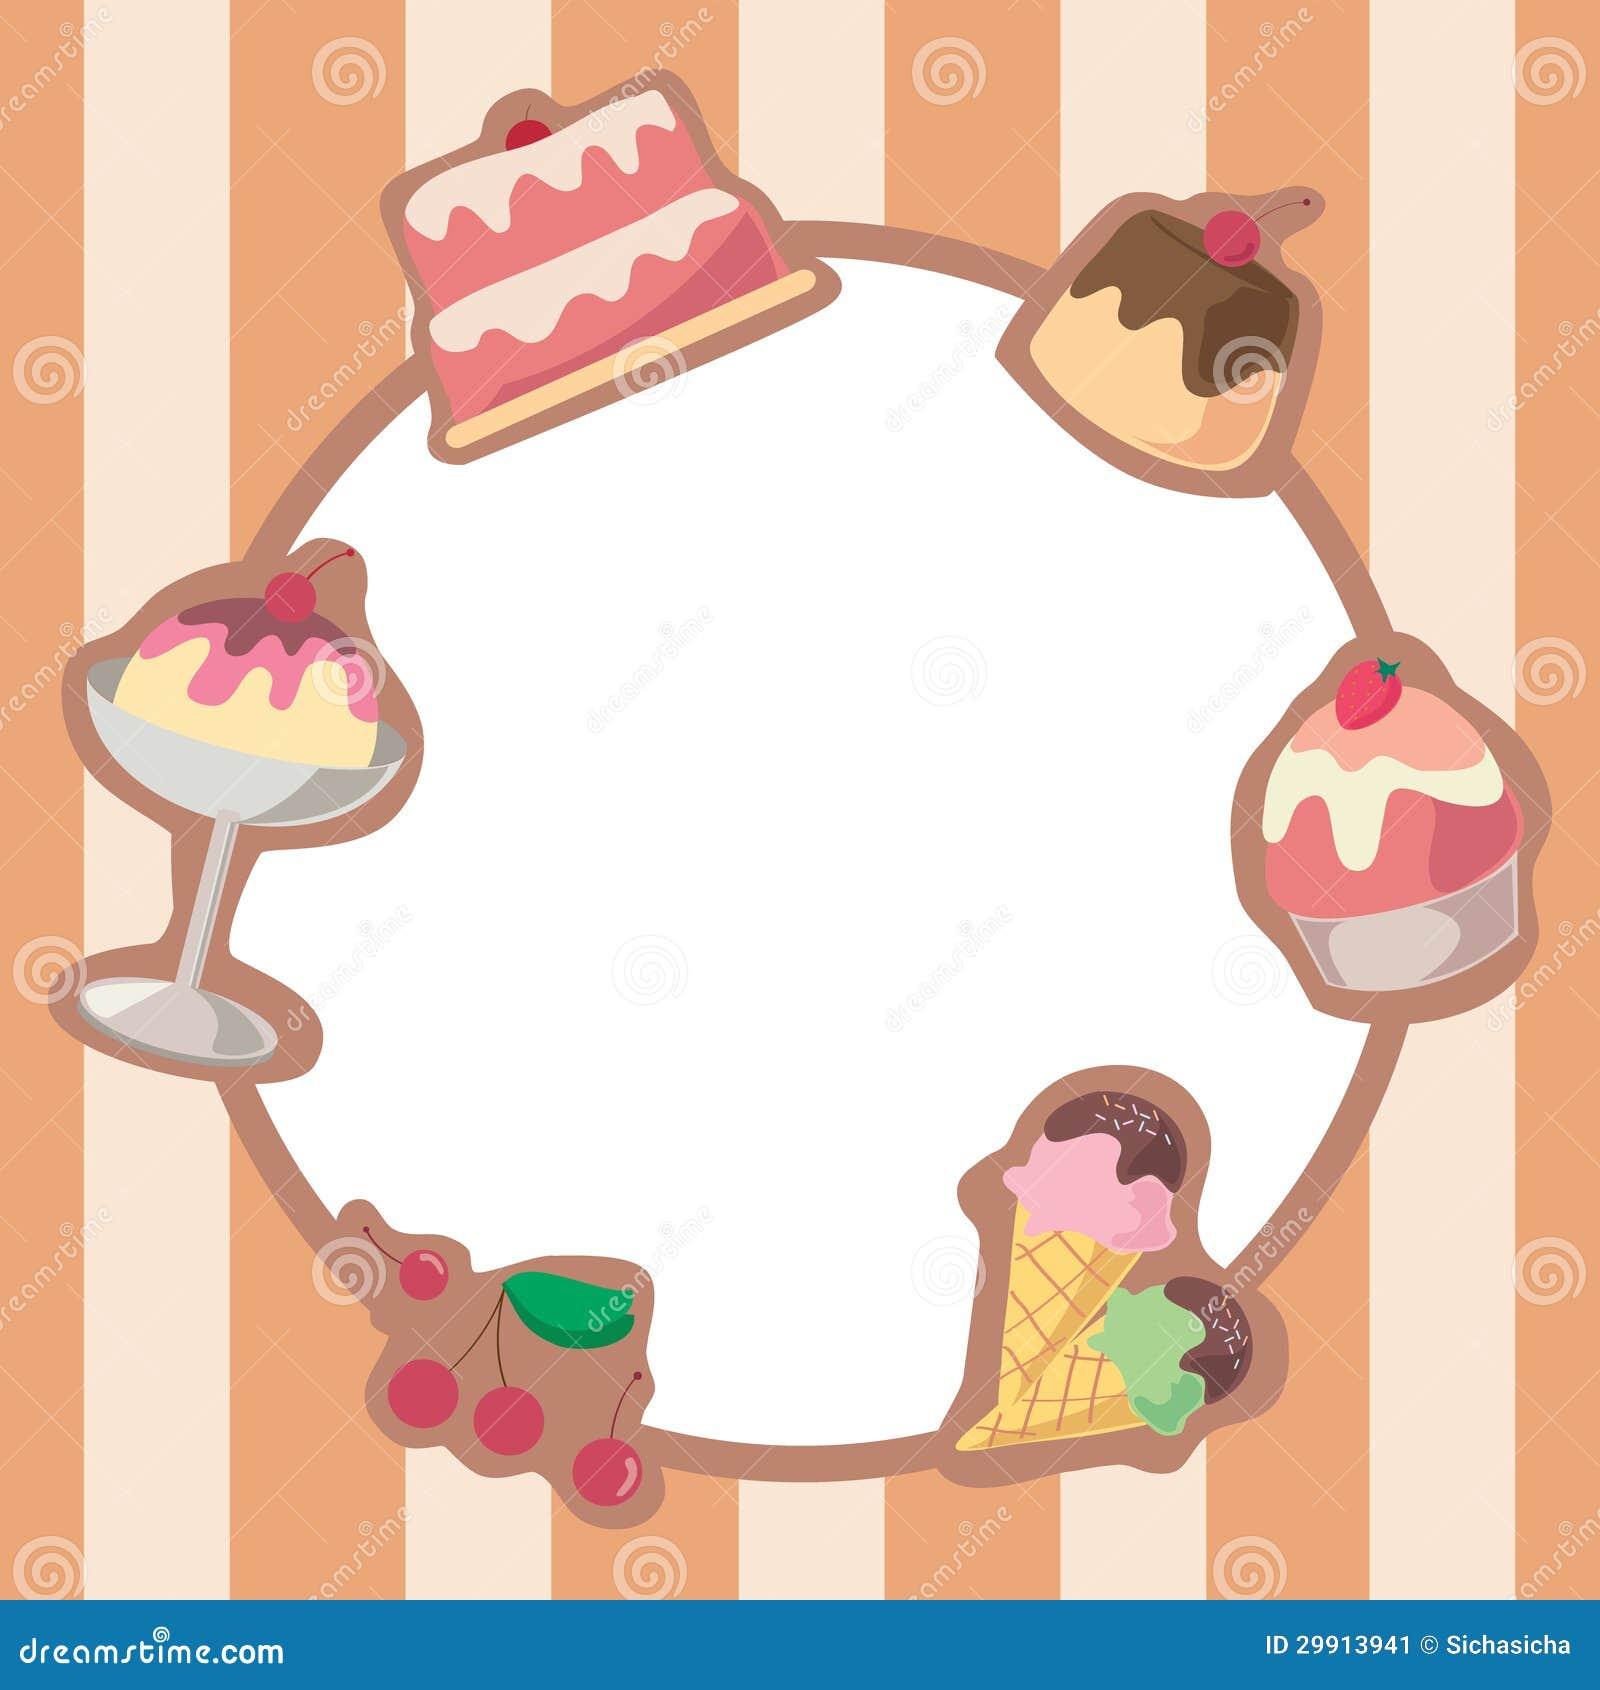 Cake And Ice Cream Frame Stock Image Image 29913941